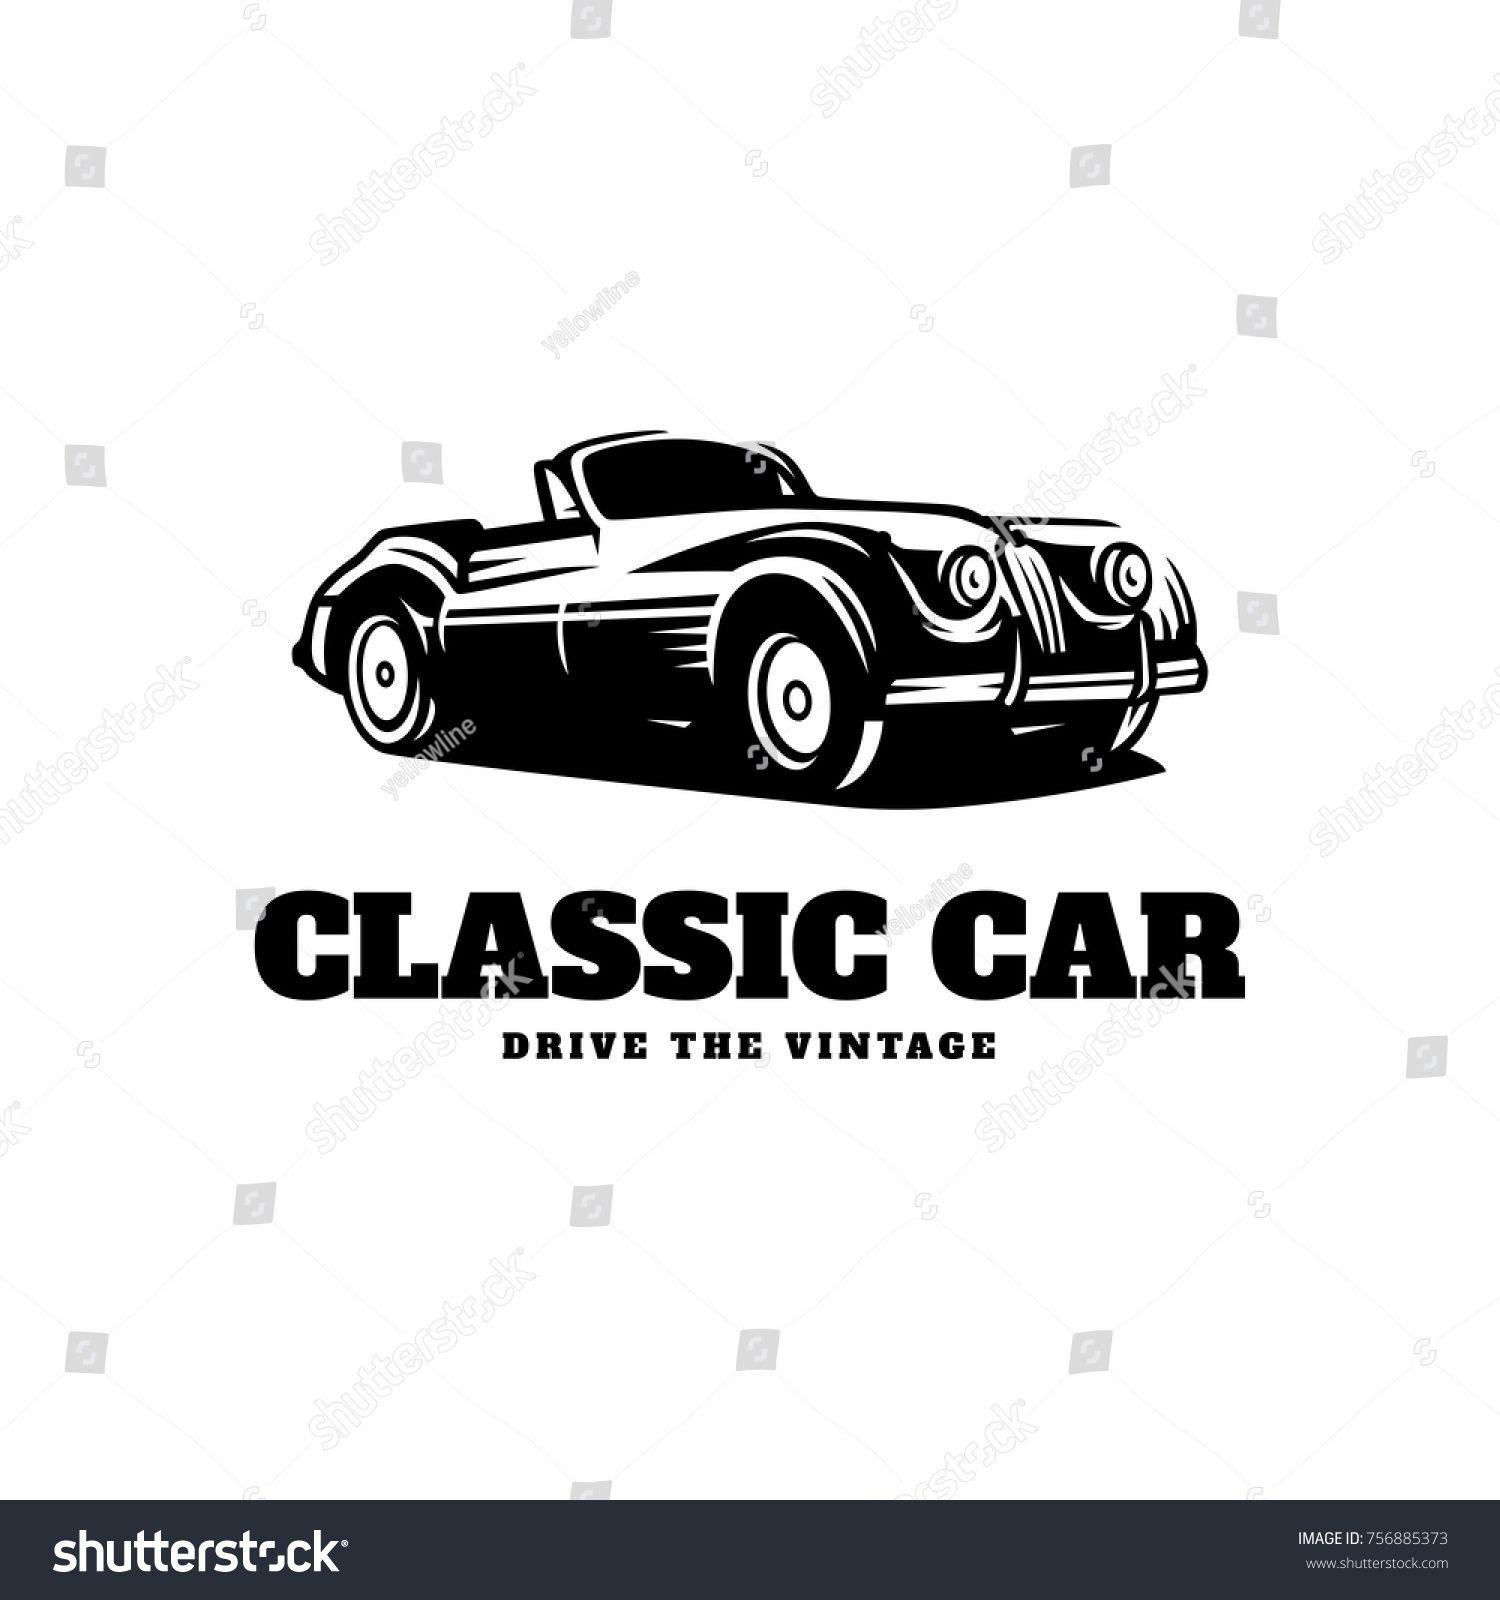 Classic Car Illustration Classic Car Logo Stock Vector (Royalty Free) 756885373